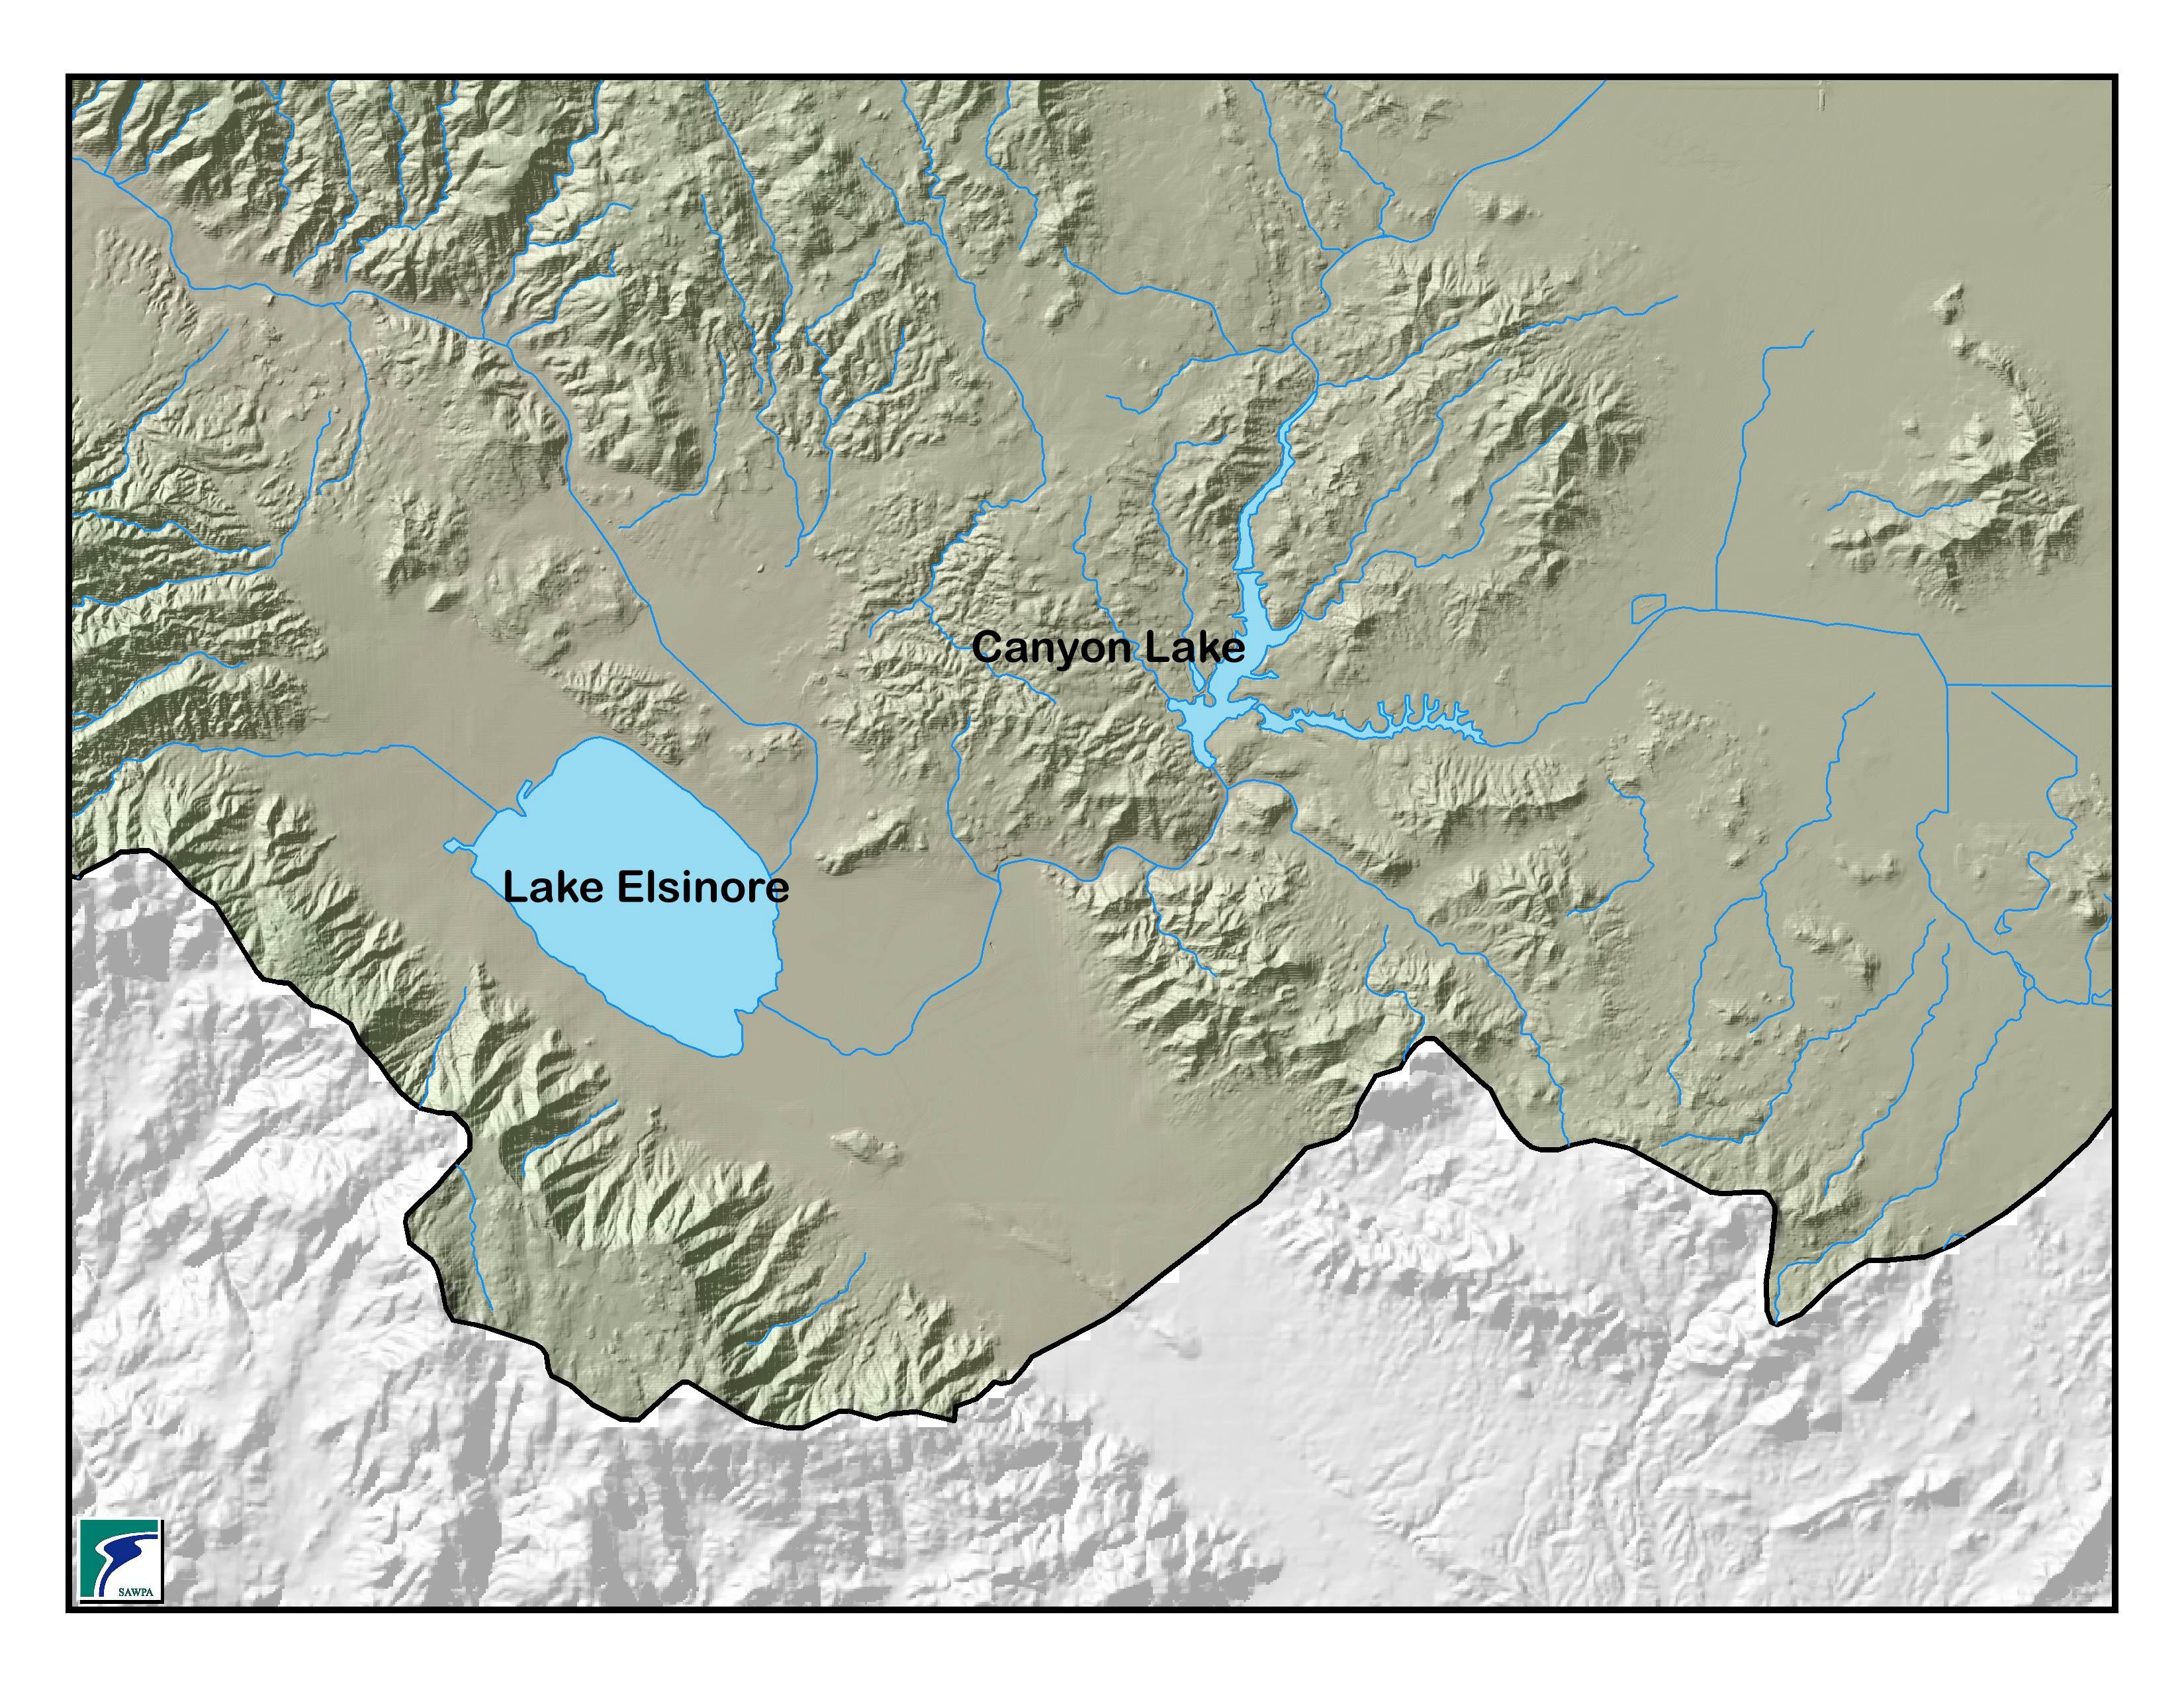 Lake Elsinore Canyon Lake TMDL Task Force Santa Ana Watershed